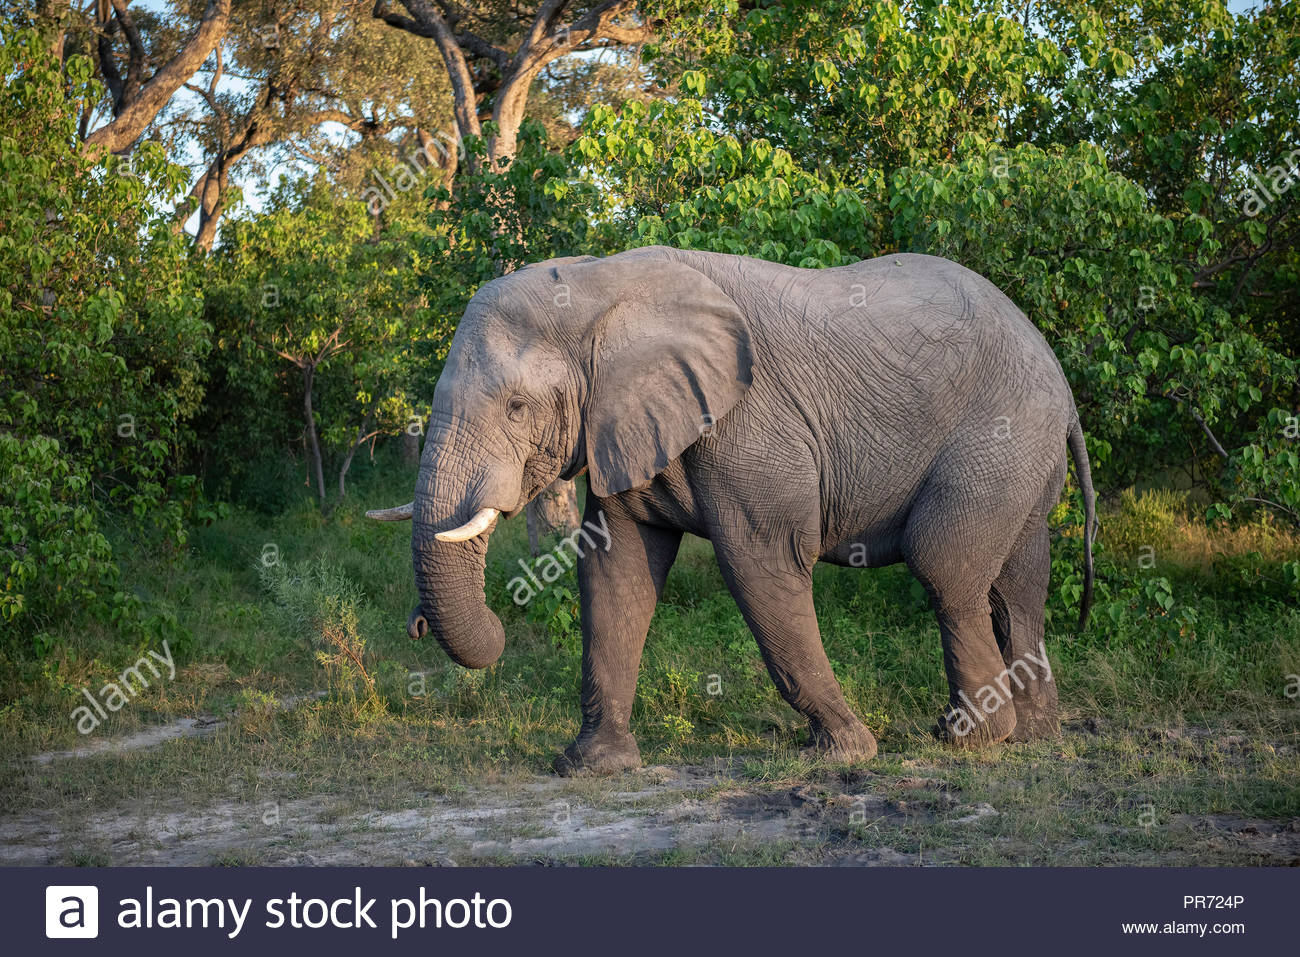 Elephant walking and feeding along the treeline in Botswana - Stock Image